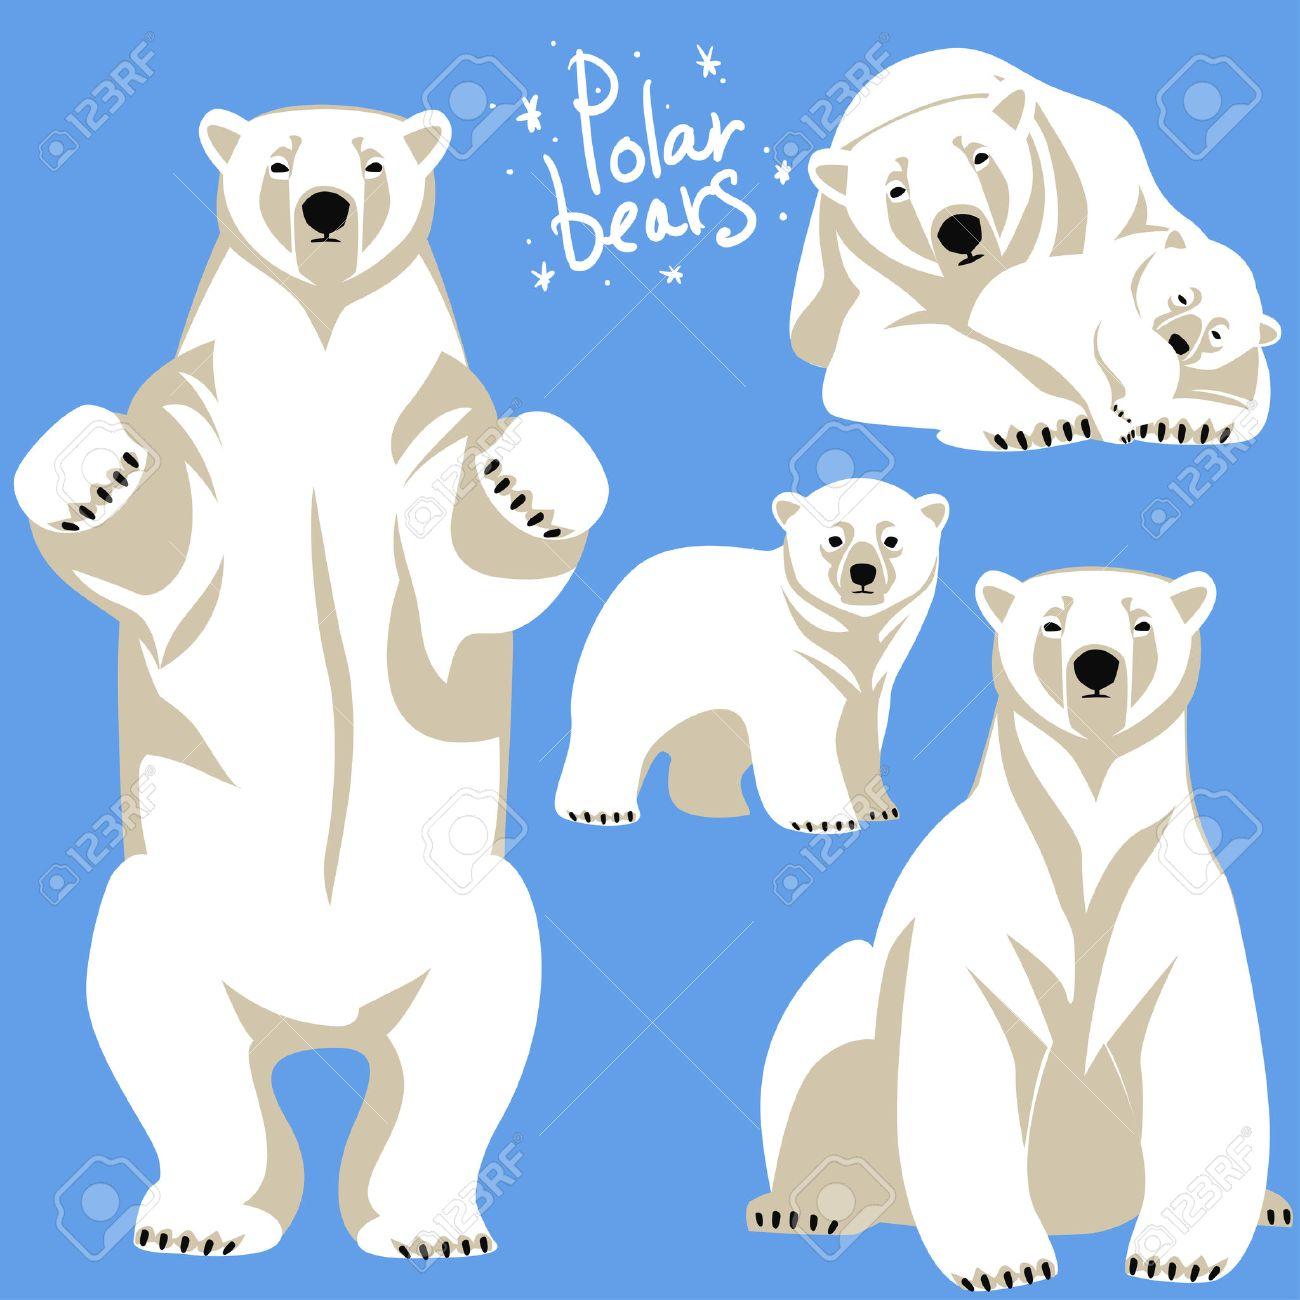 polar bear stock photos royalty free polar bear images and pictures